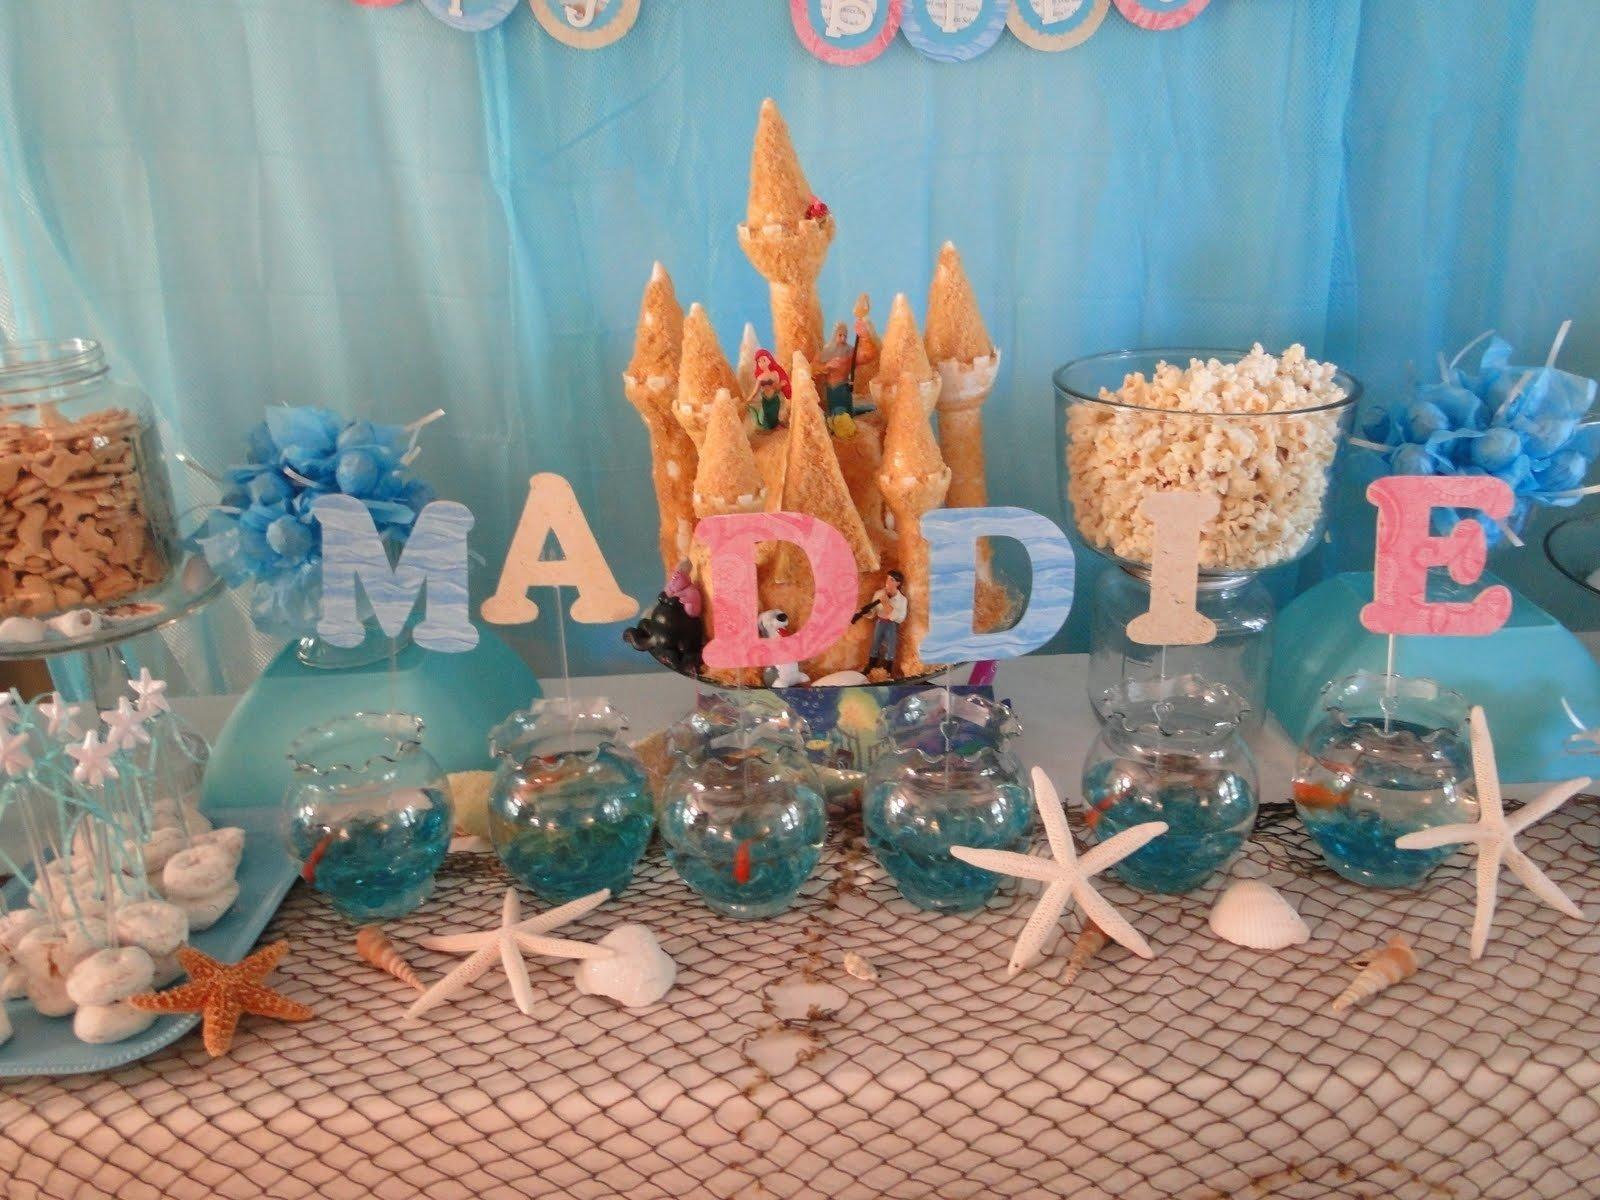 10 Pretty Little Mermaid Birthday Party Ideas karas party ideas little mermaid under the sea birthday party 2021